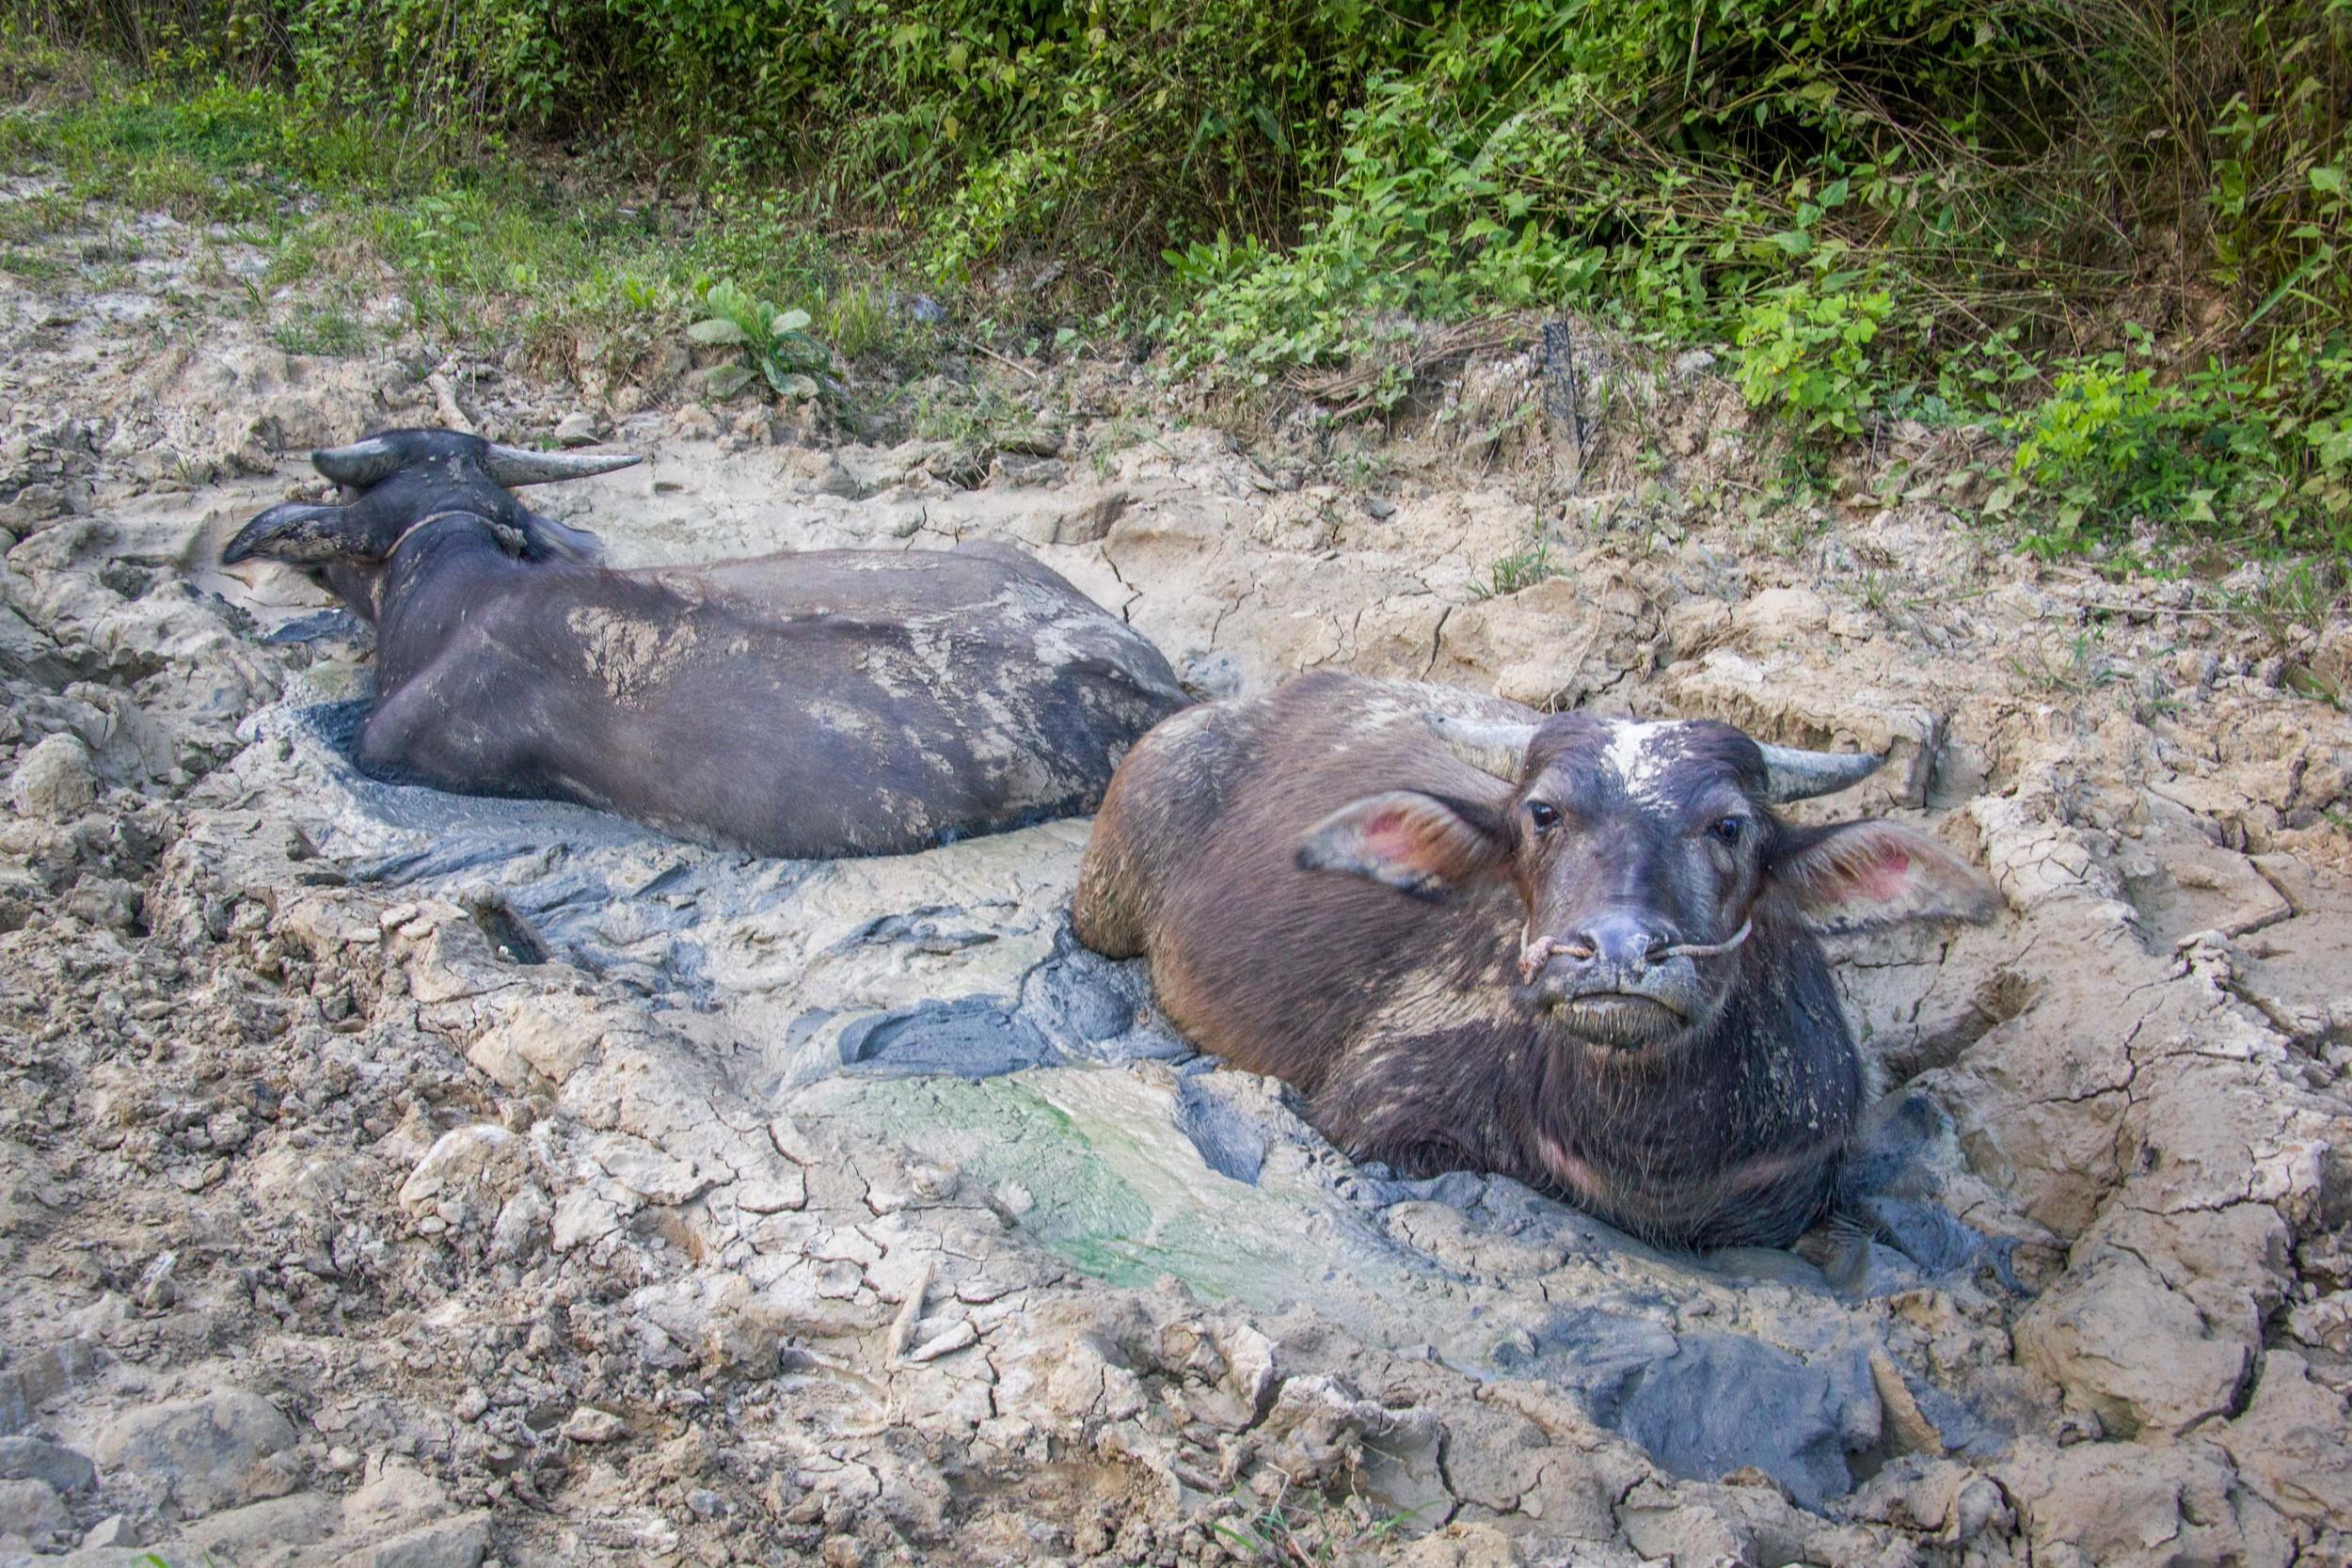 Some buffalo loving life